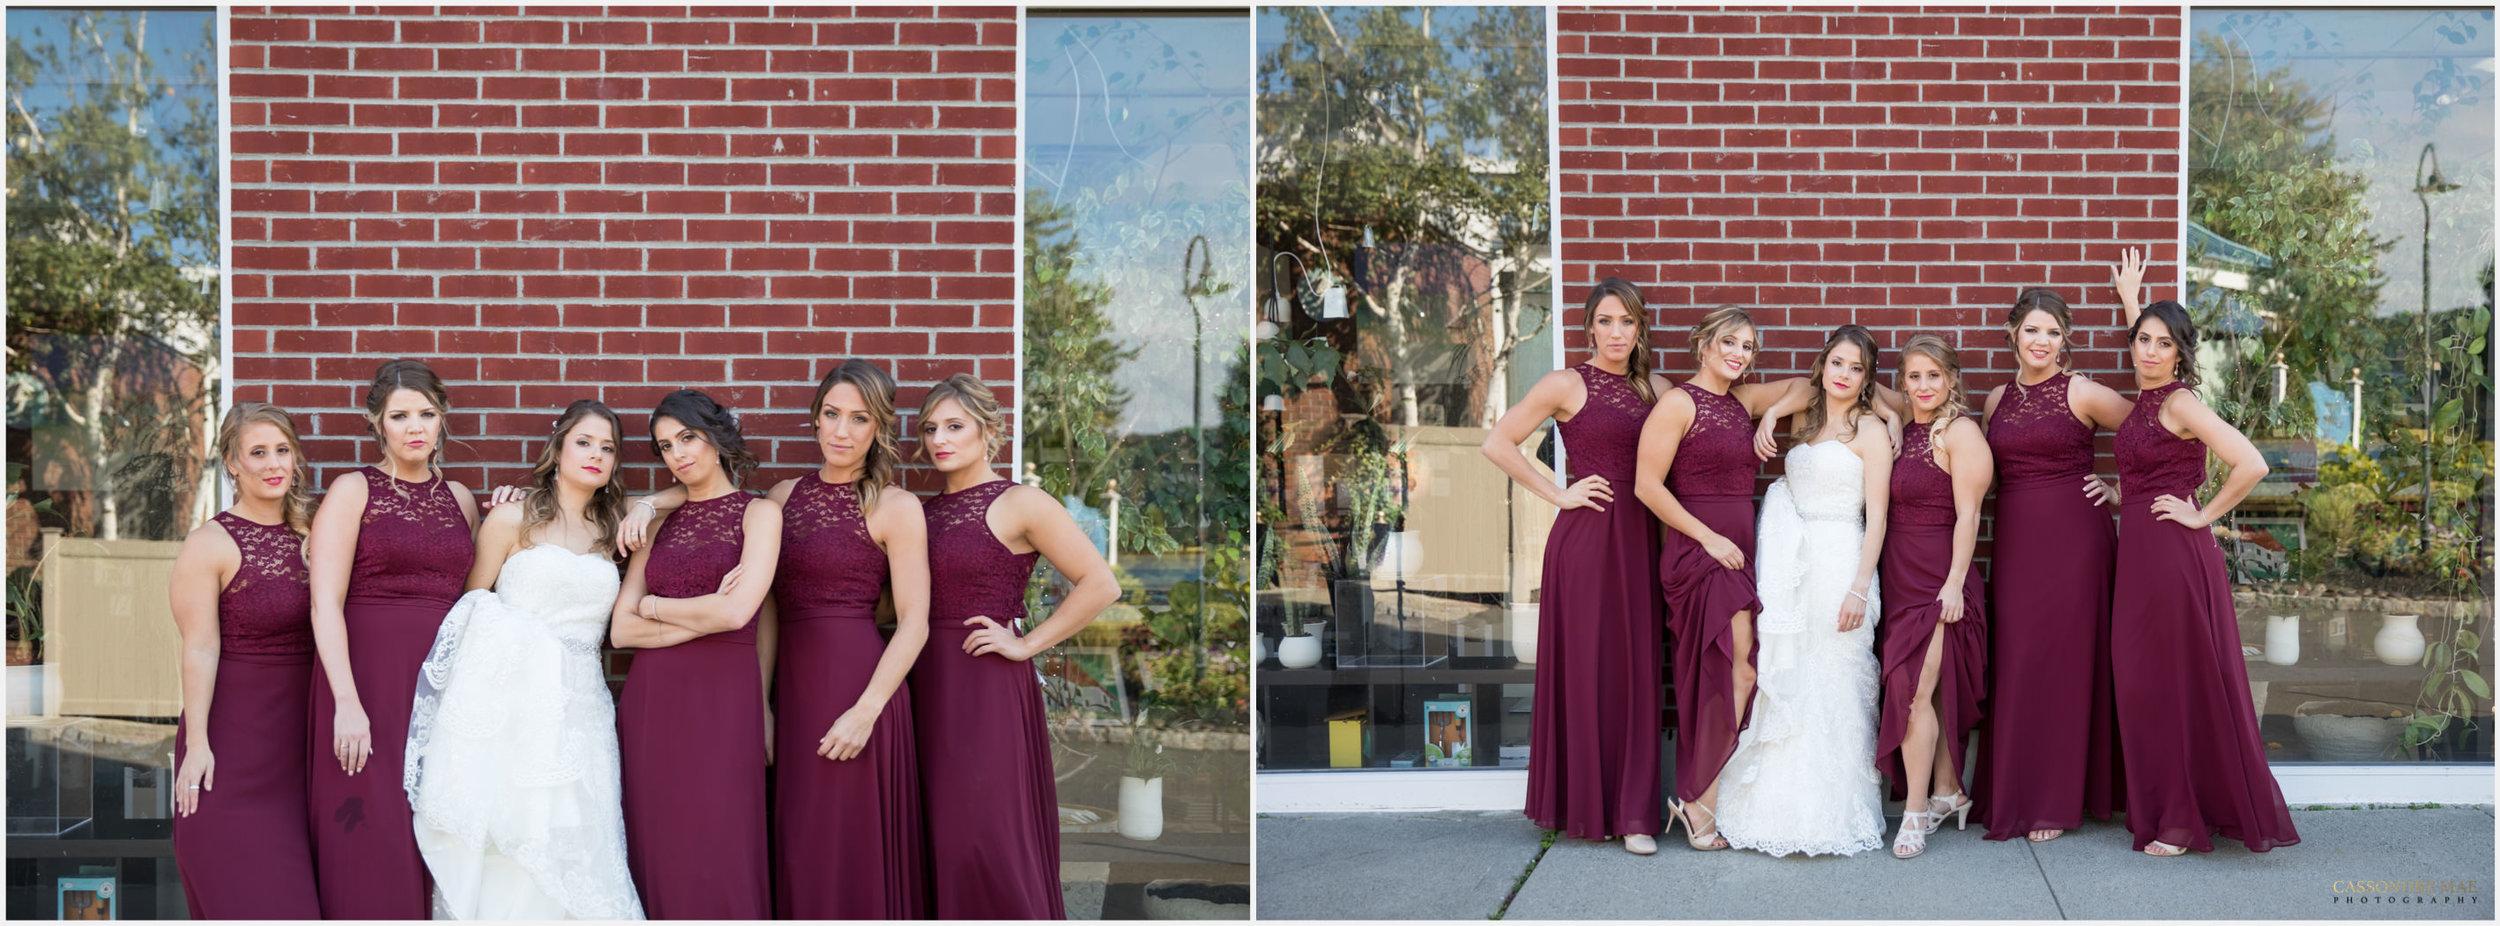 Views on the Hudson Wedding Photos Cassondre Mae Photography 25.jpg